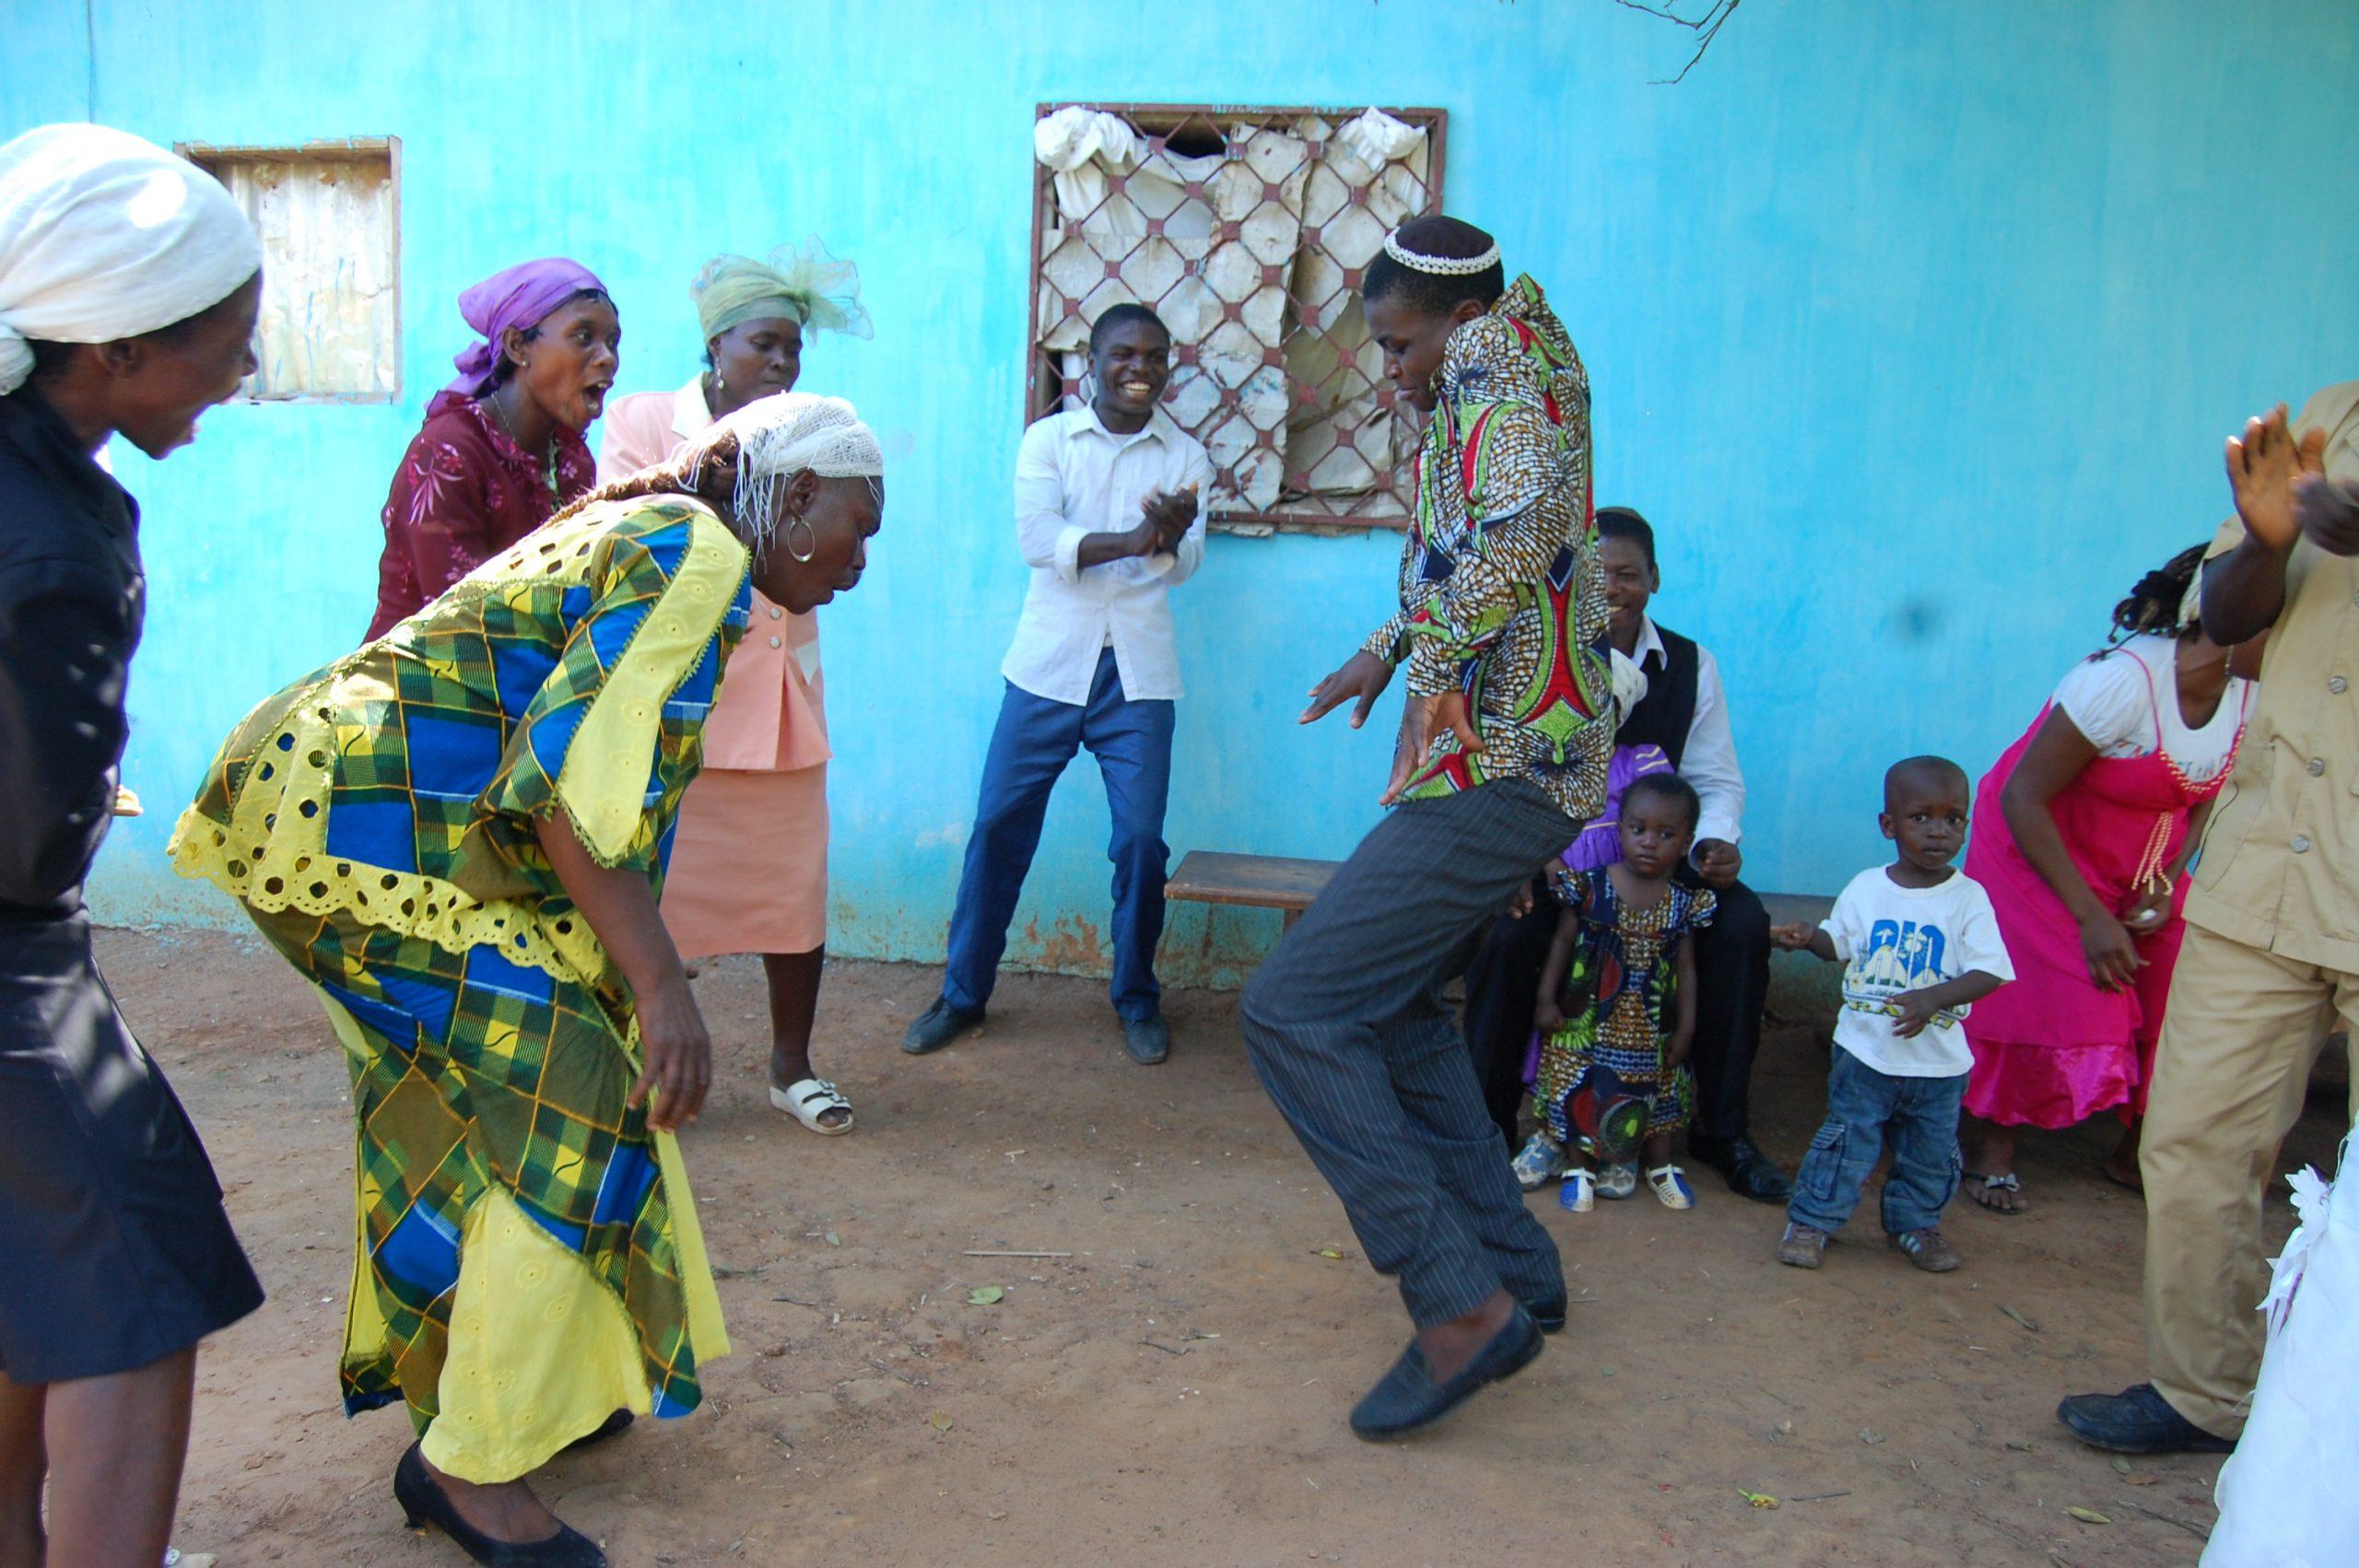 Dancing to celebrate the Torah